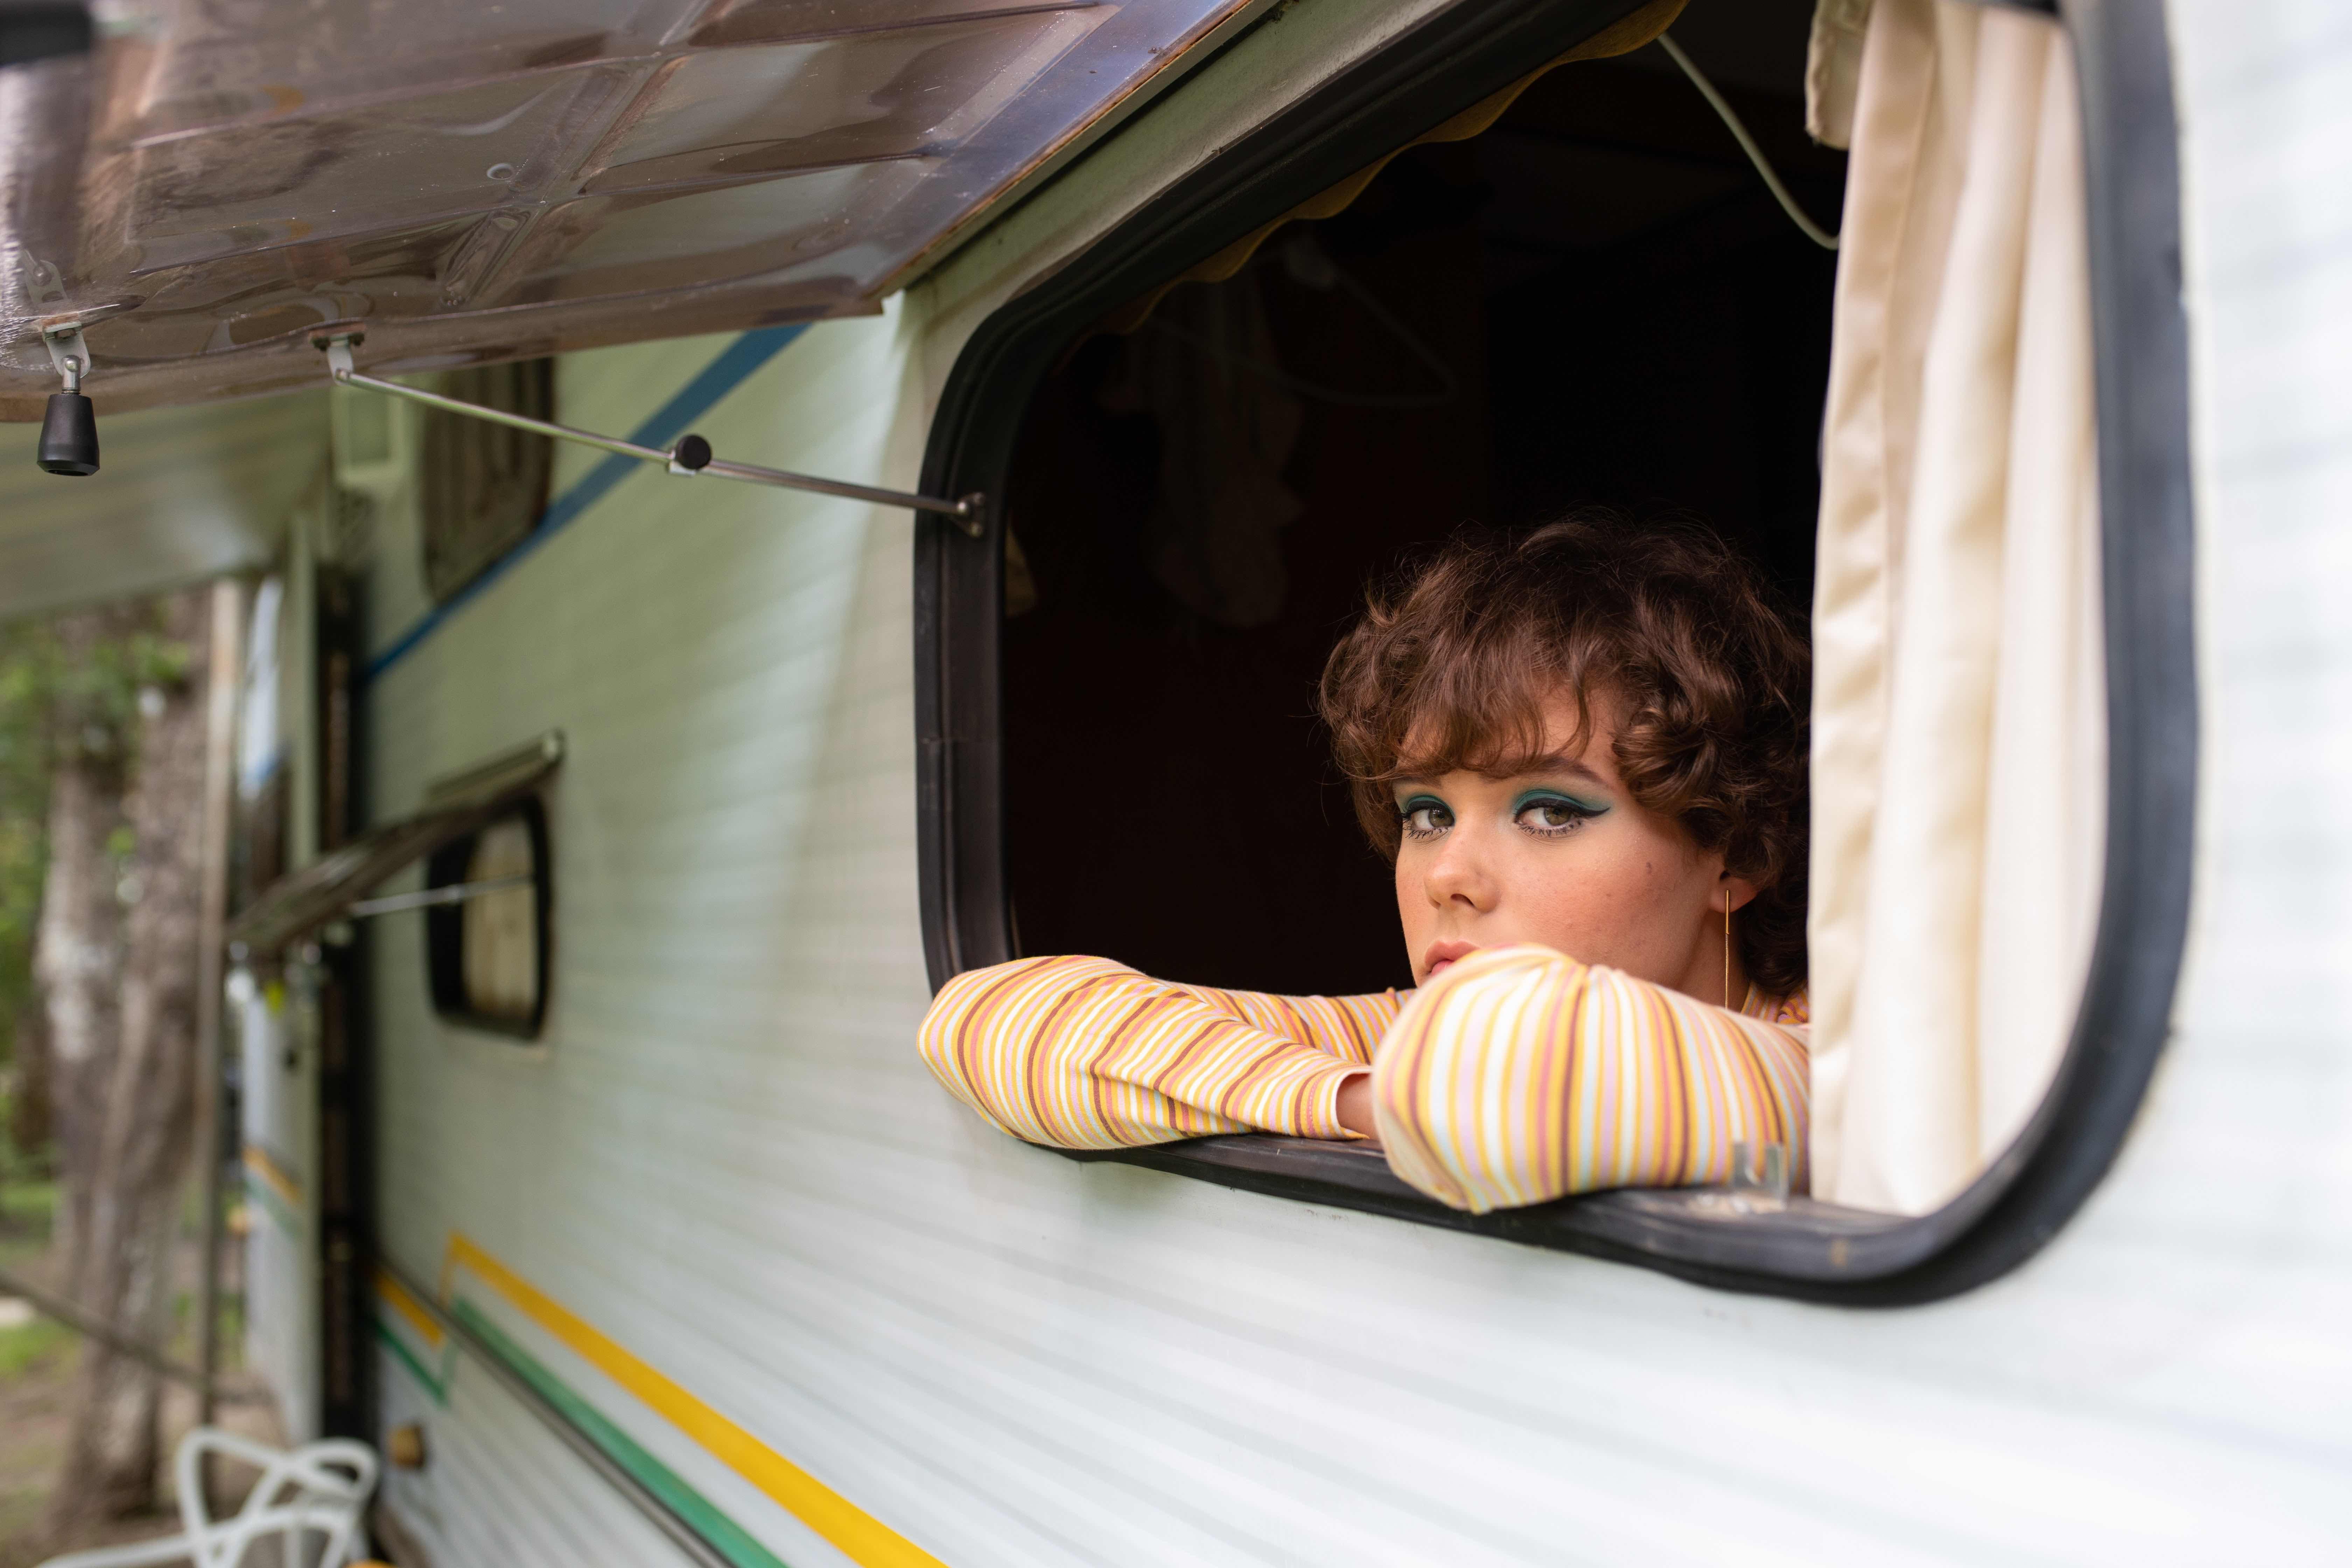 A girl in a camper van